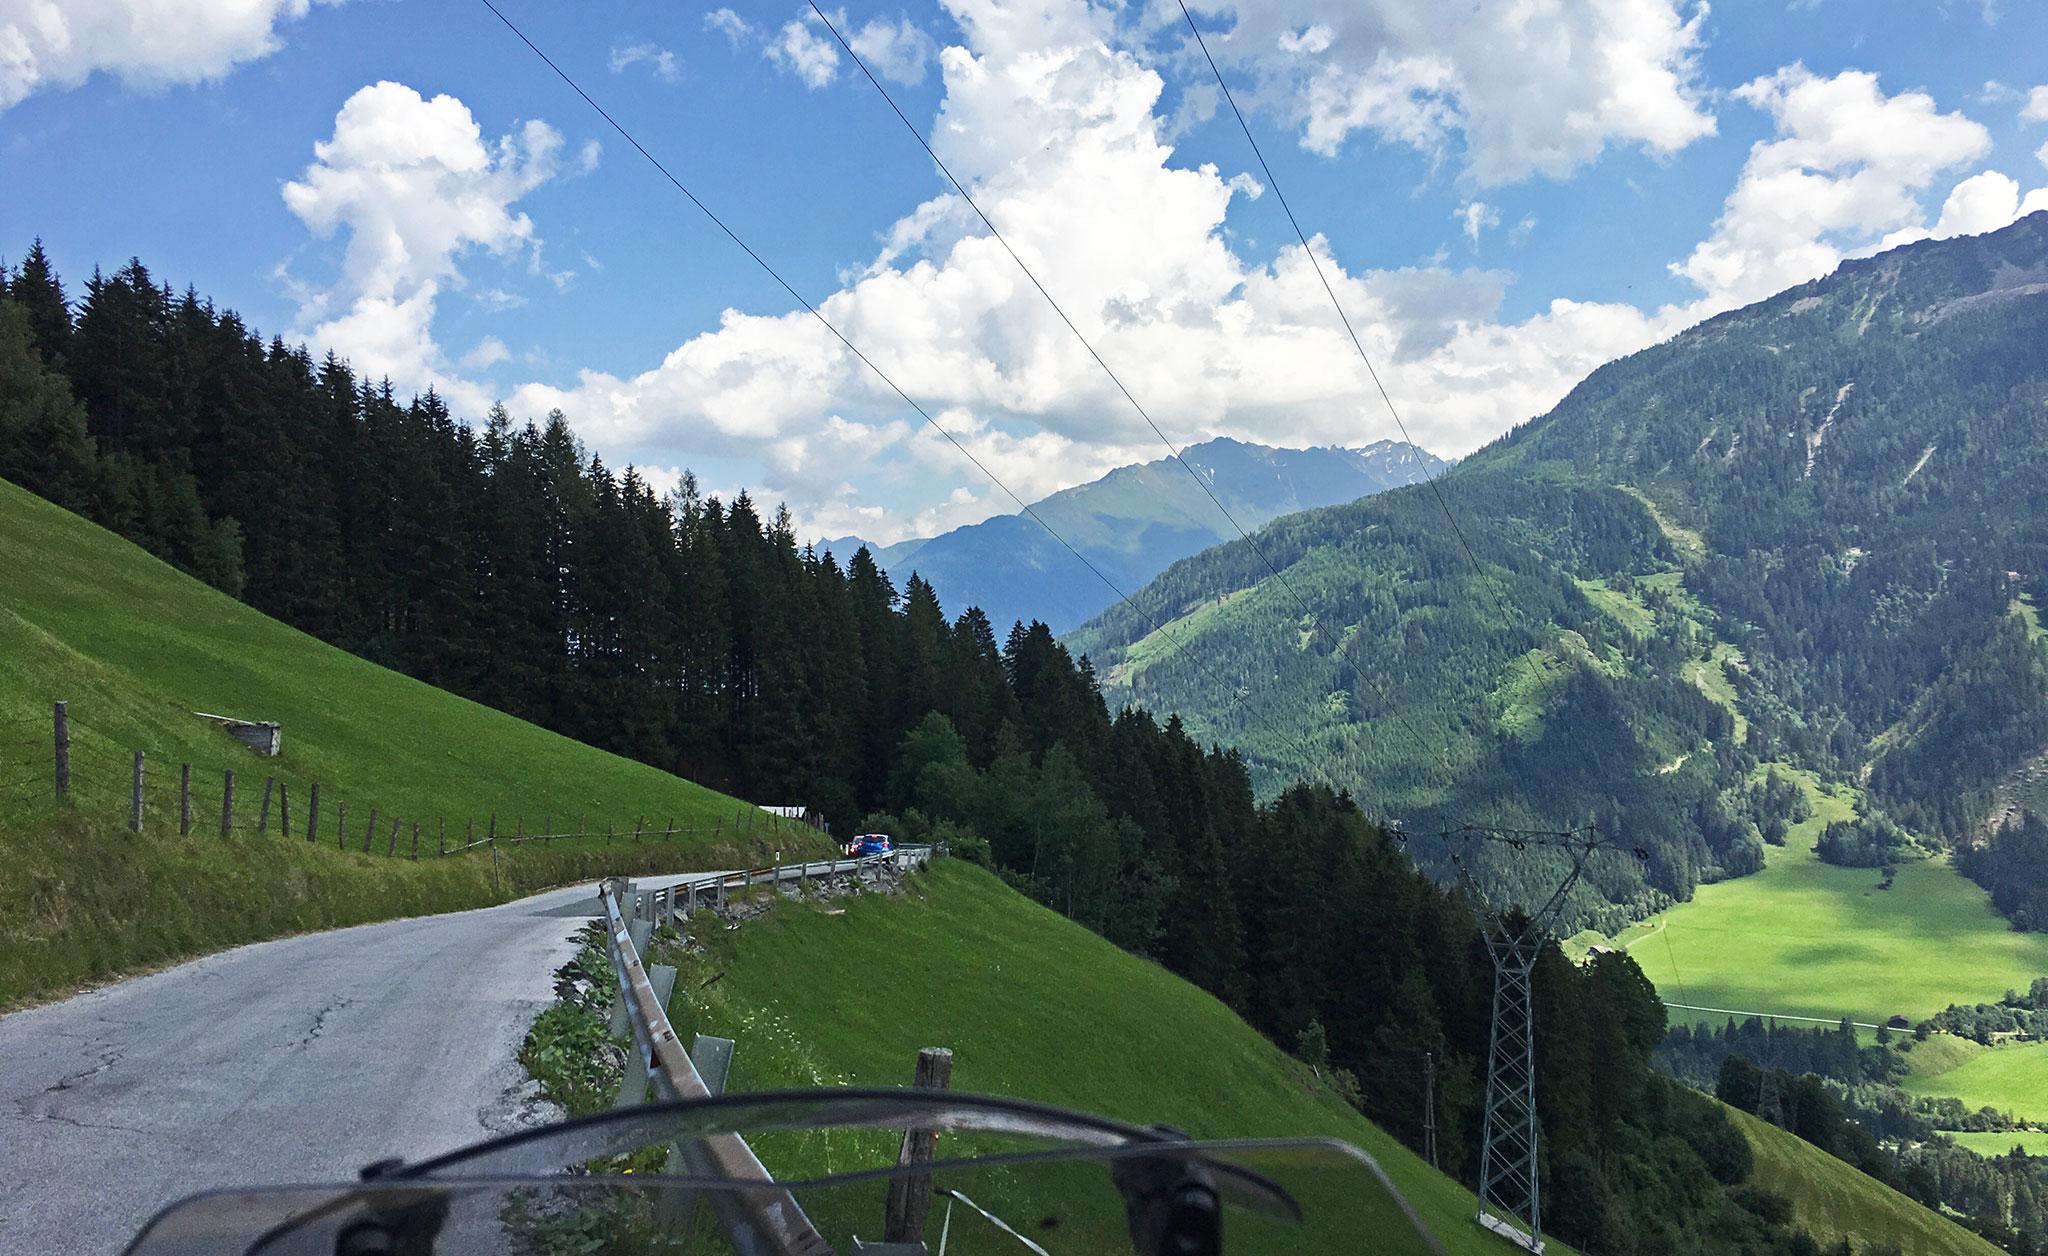 Smallway in Austria